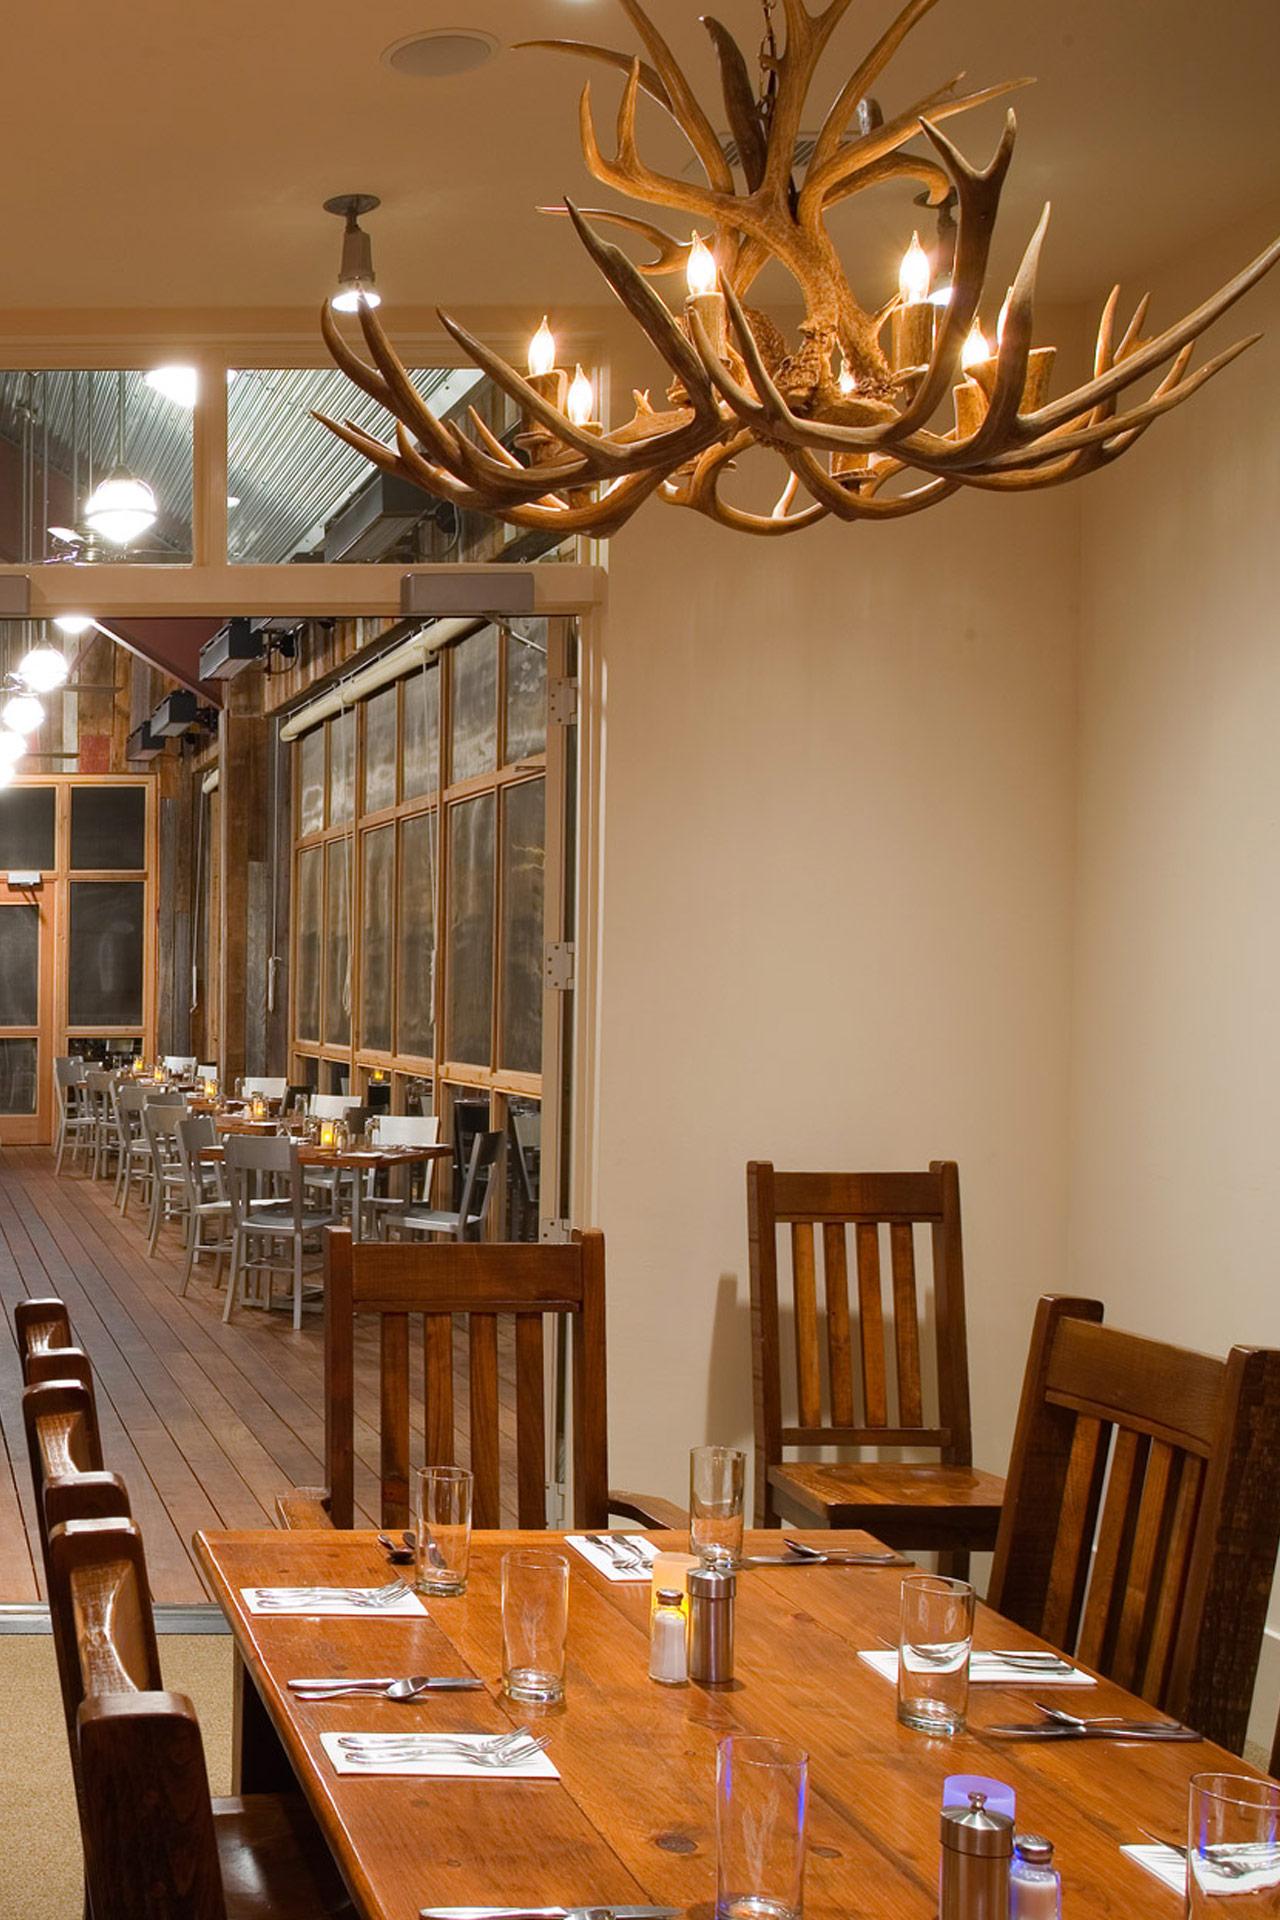 Firefly Grill restaurant interiors